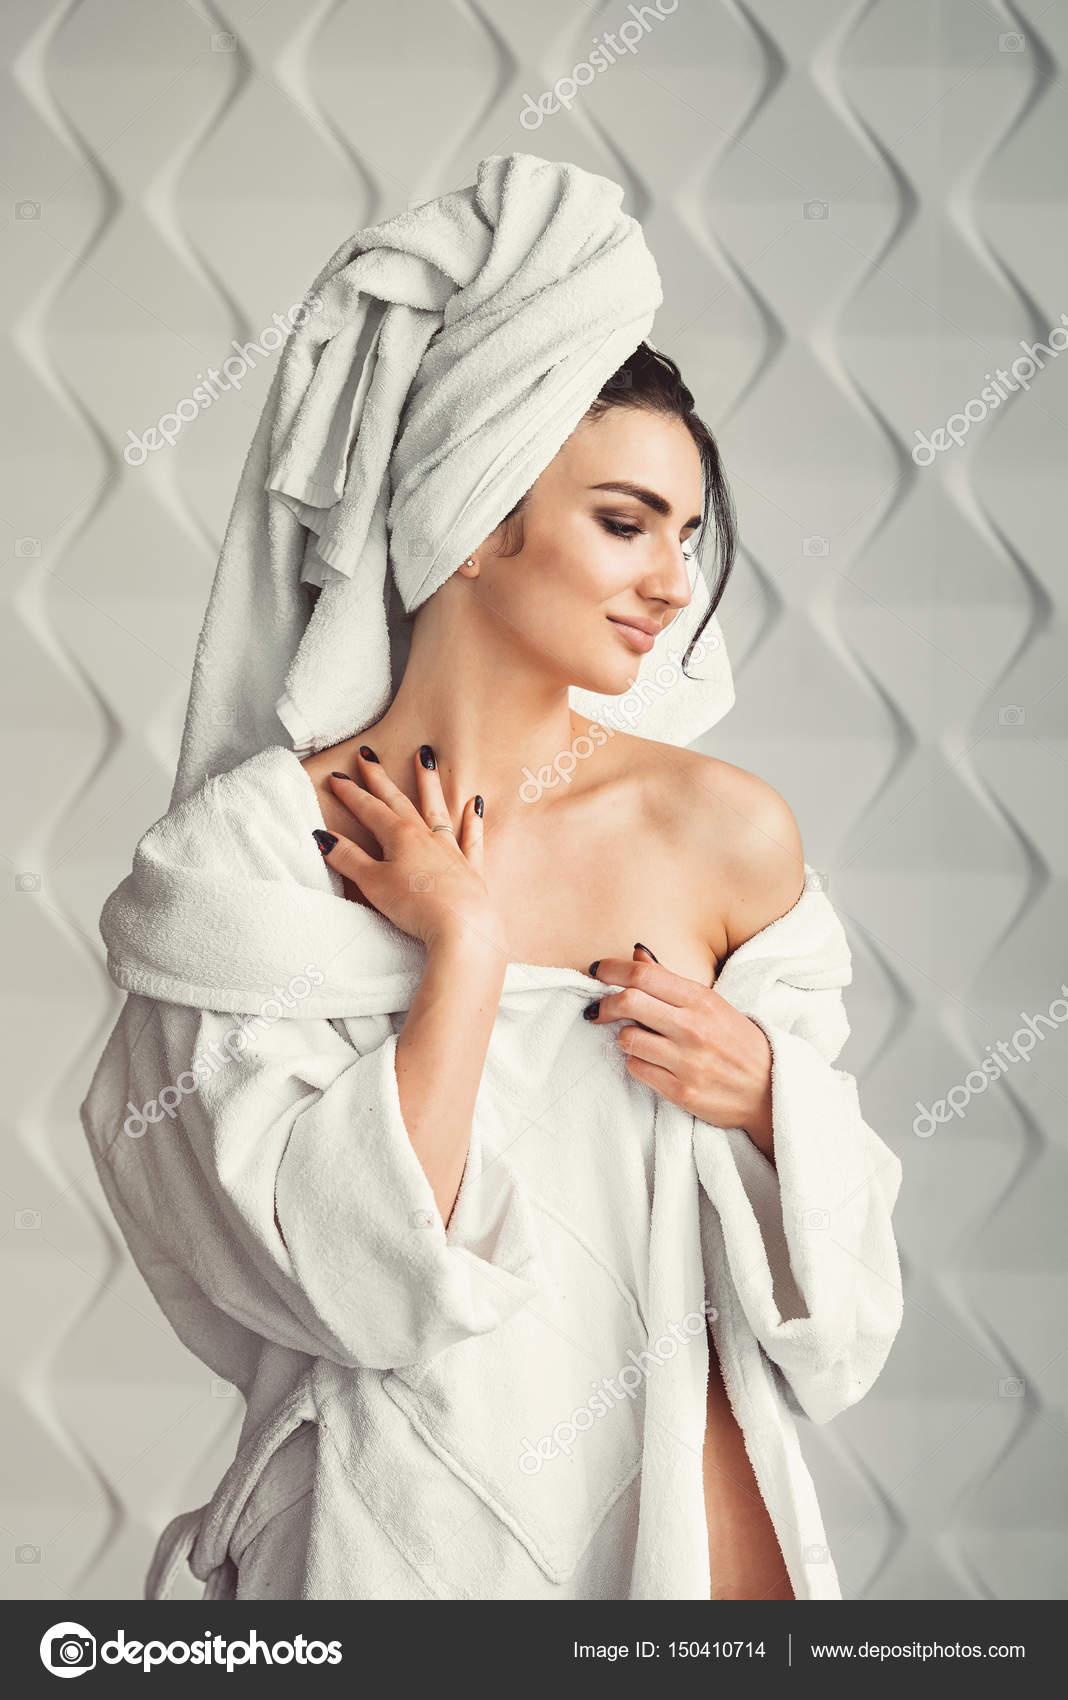 Bianca beauchamp best nude